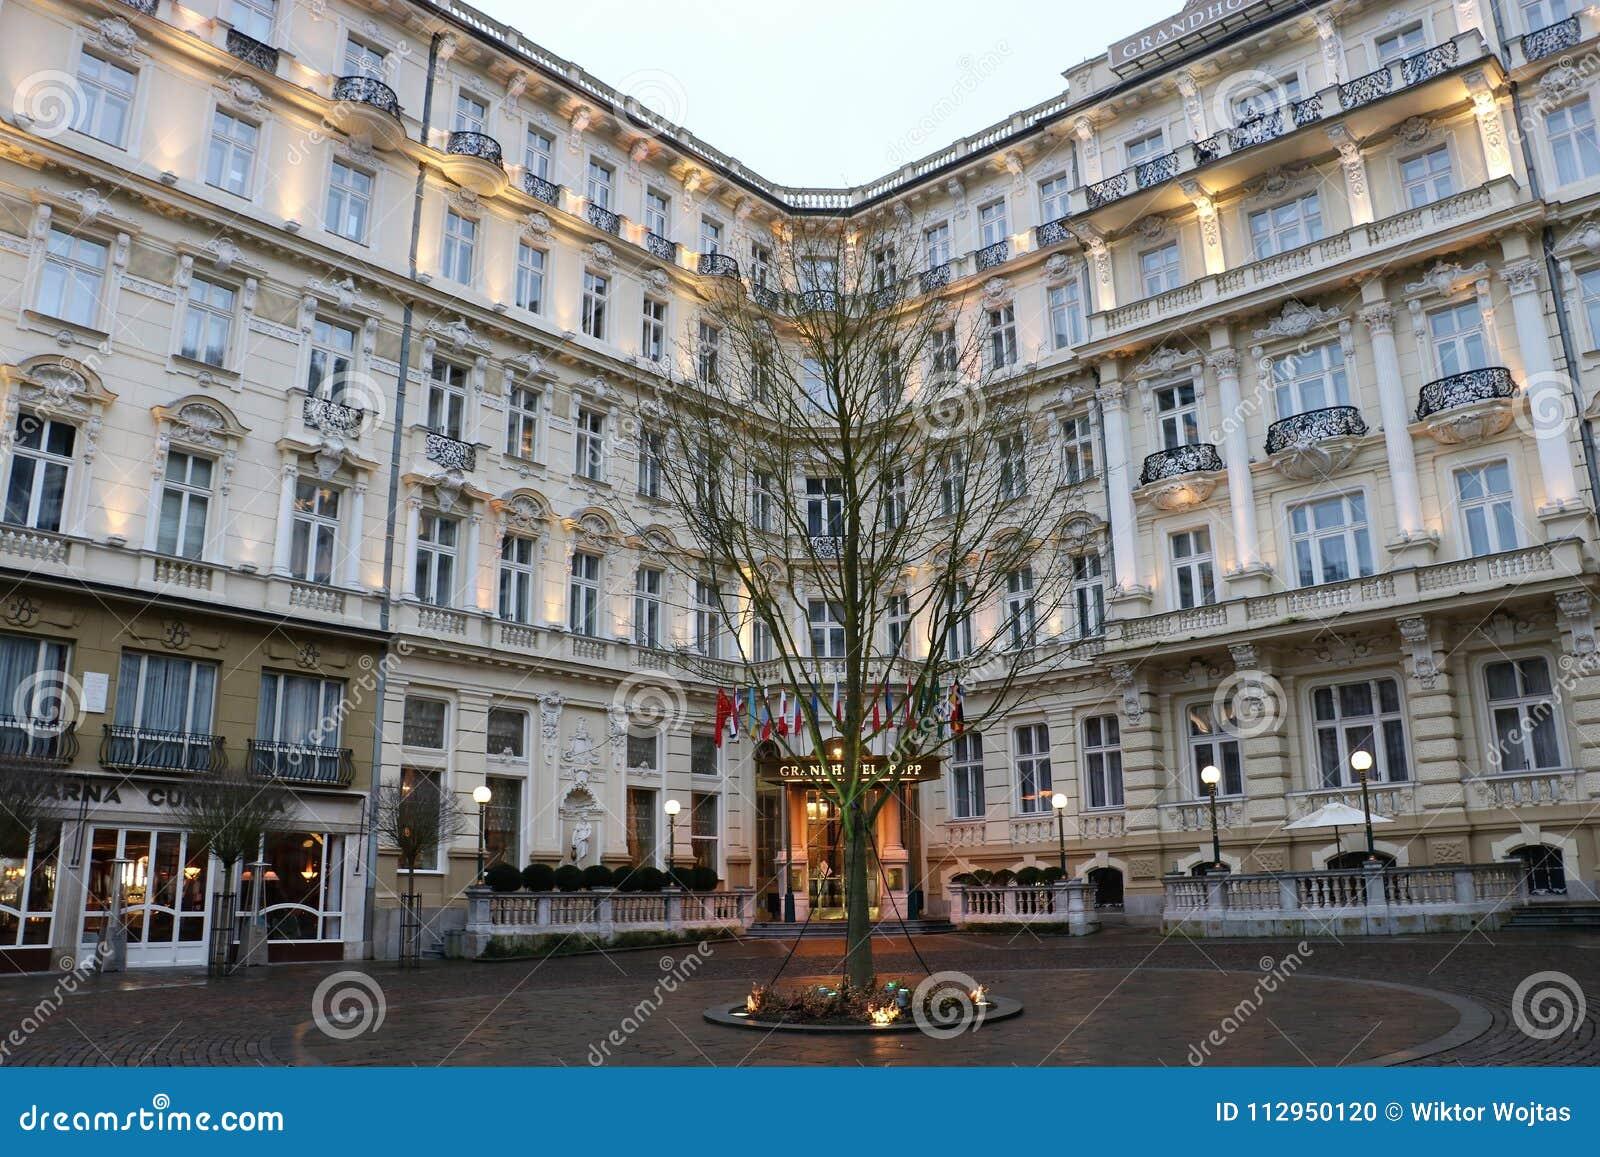 Grandhotel Pupp Karlovy Vary Editorial Image Image Of Luxury International 112950120